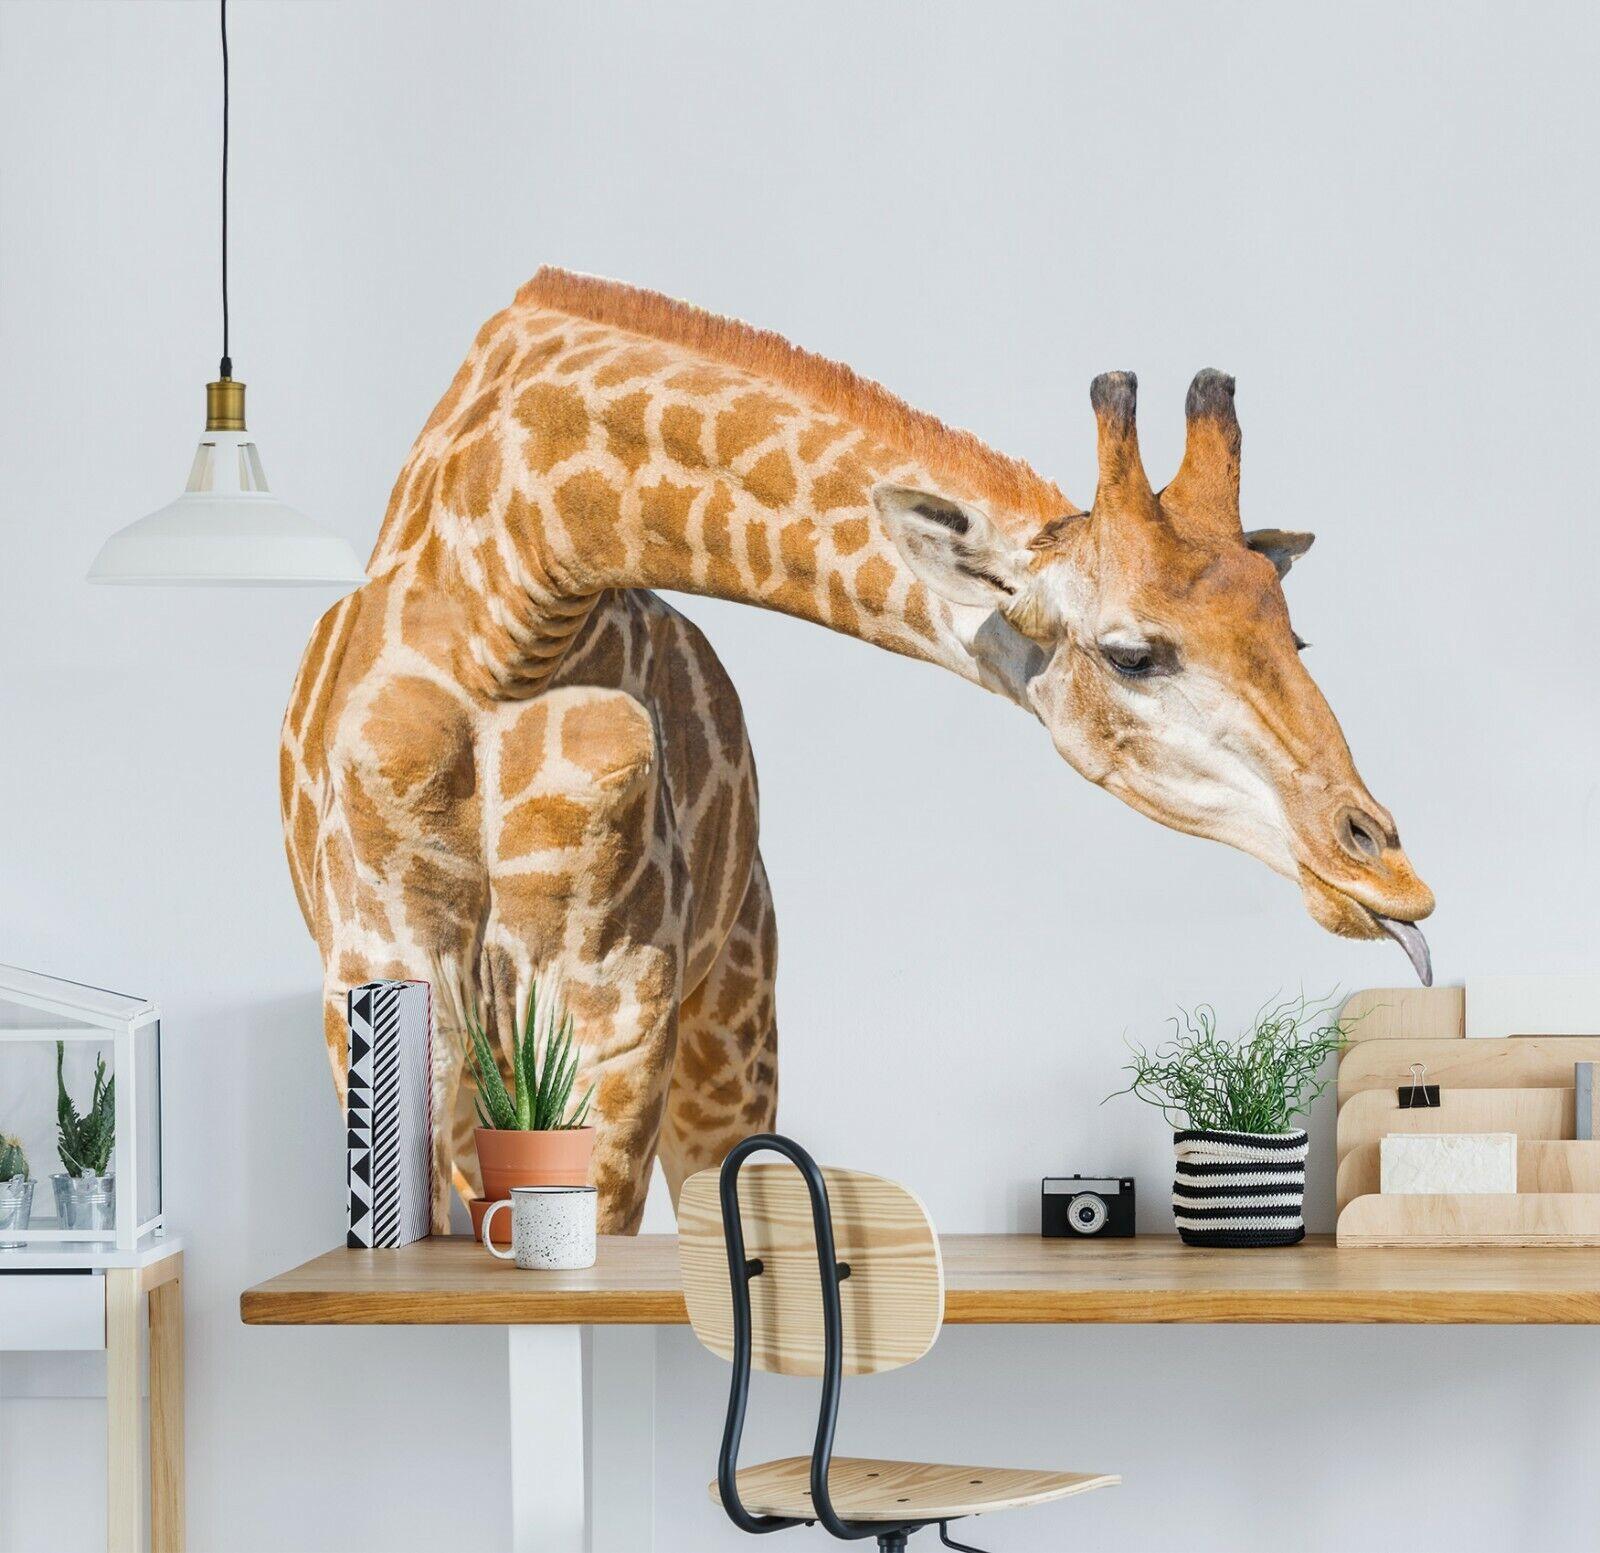 3D Giraffe Tongue P17 Animal WandPapier Mural Self-adhesive Removable Zoe